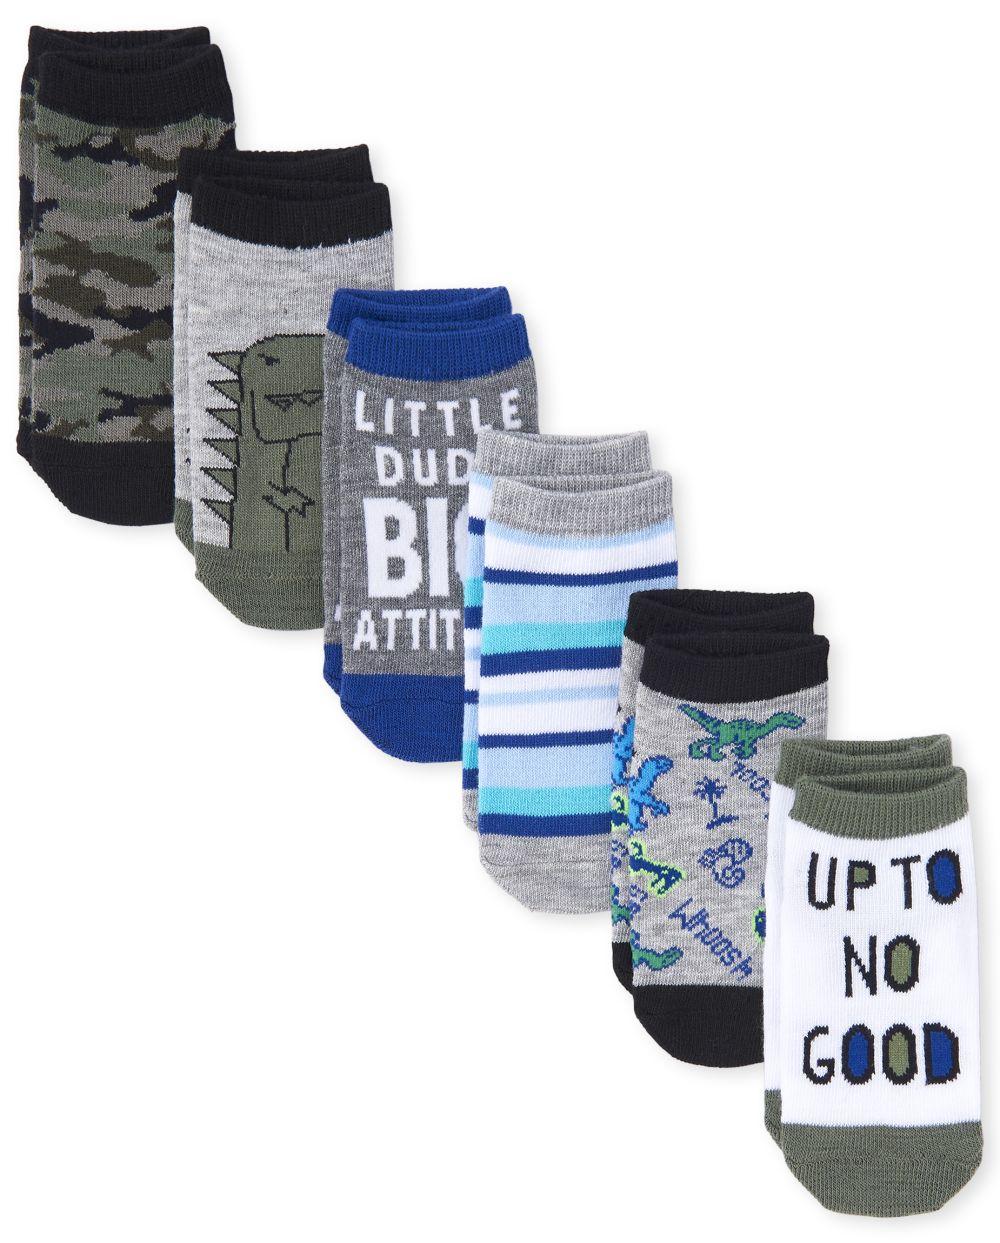 Toddler Boys Camo Dino Ankle Socks 6-Pack